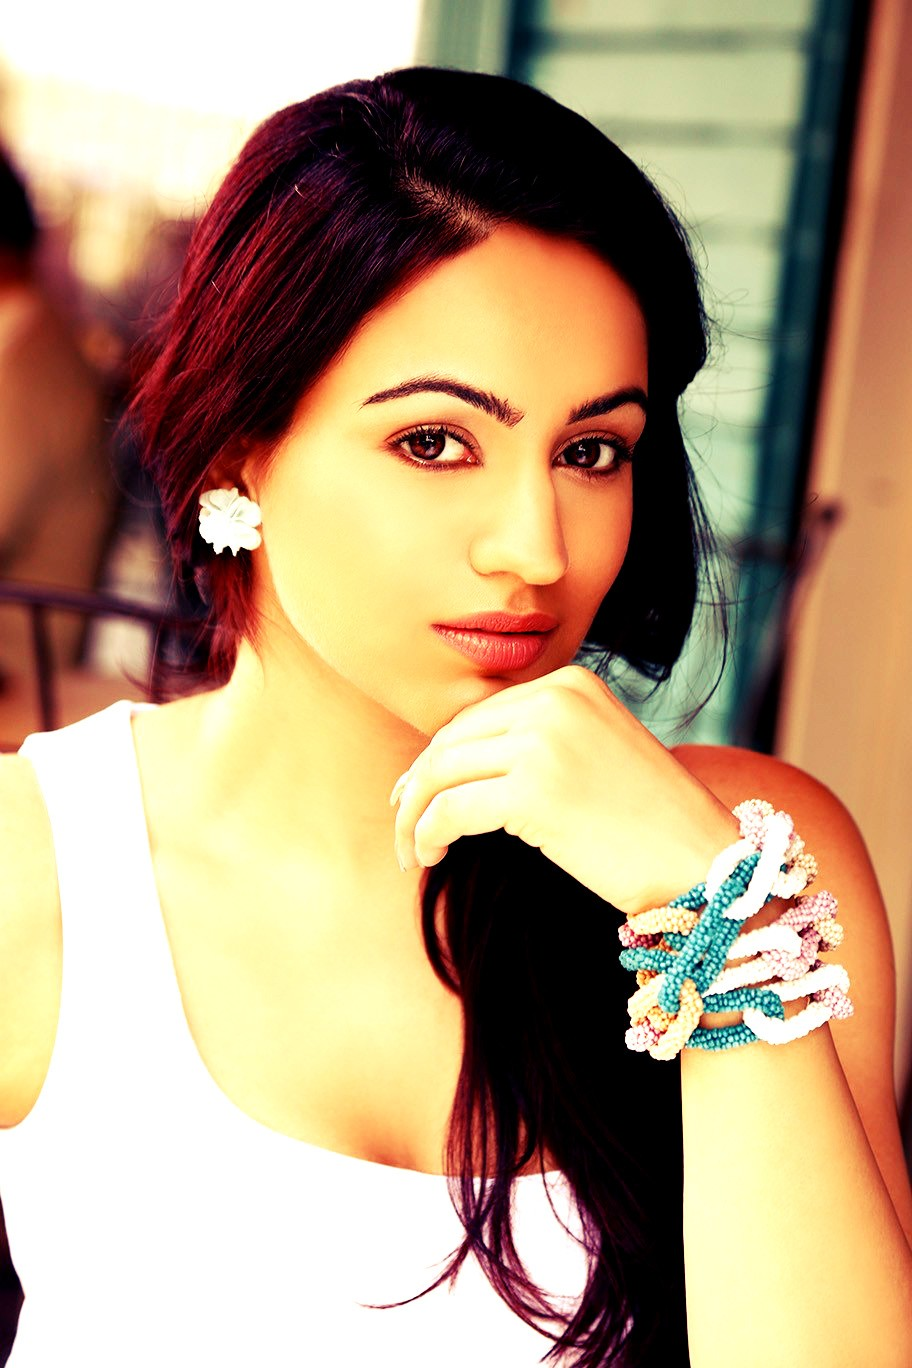 Sexy Aksha Portfolio Pics - Sexy Actress Pictures | Hot Actress Pictures